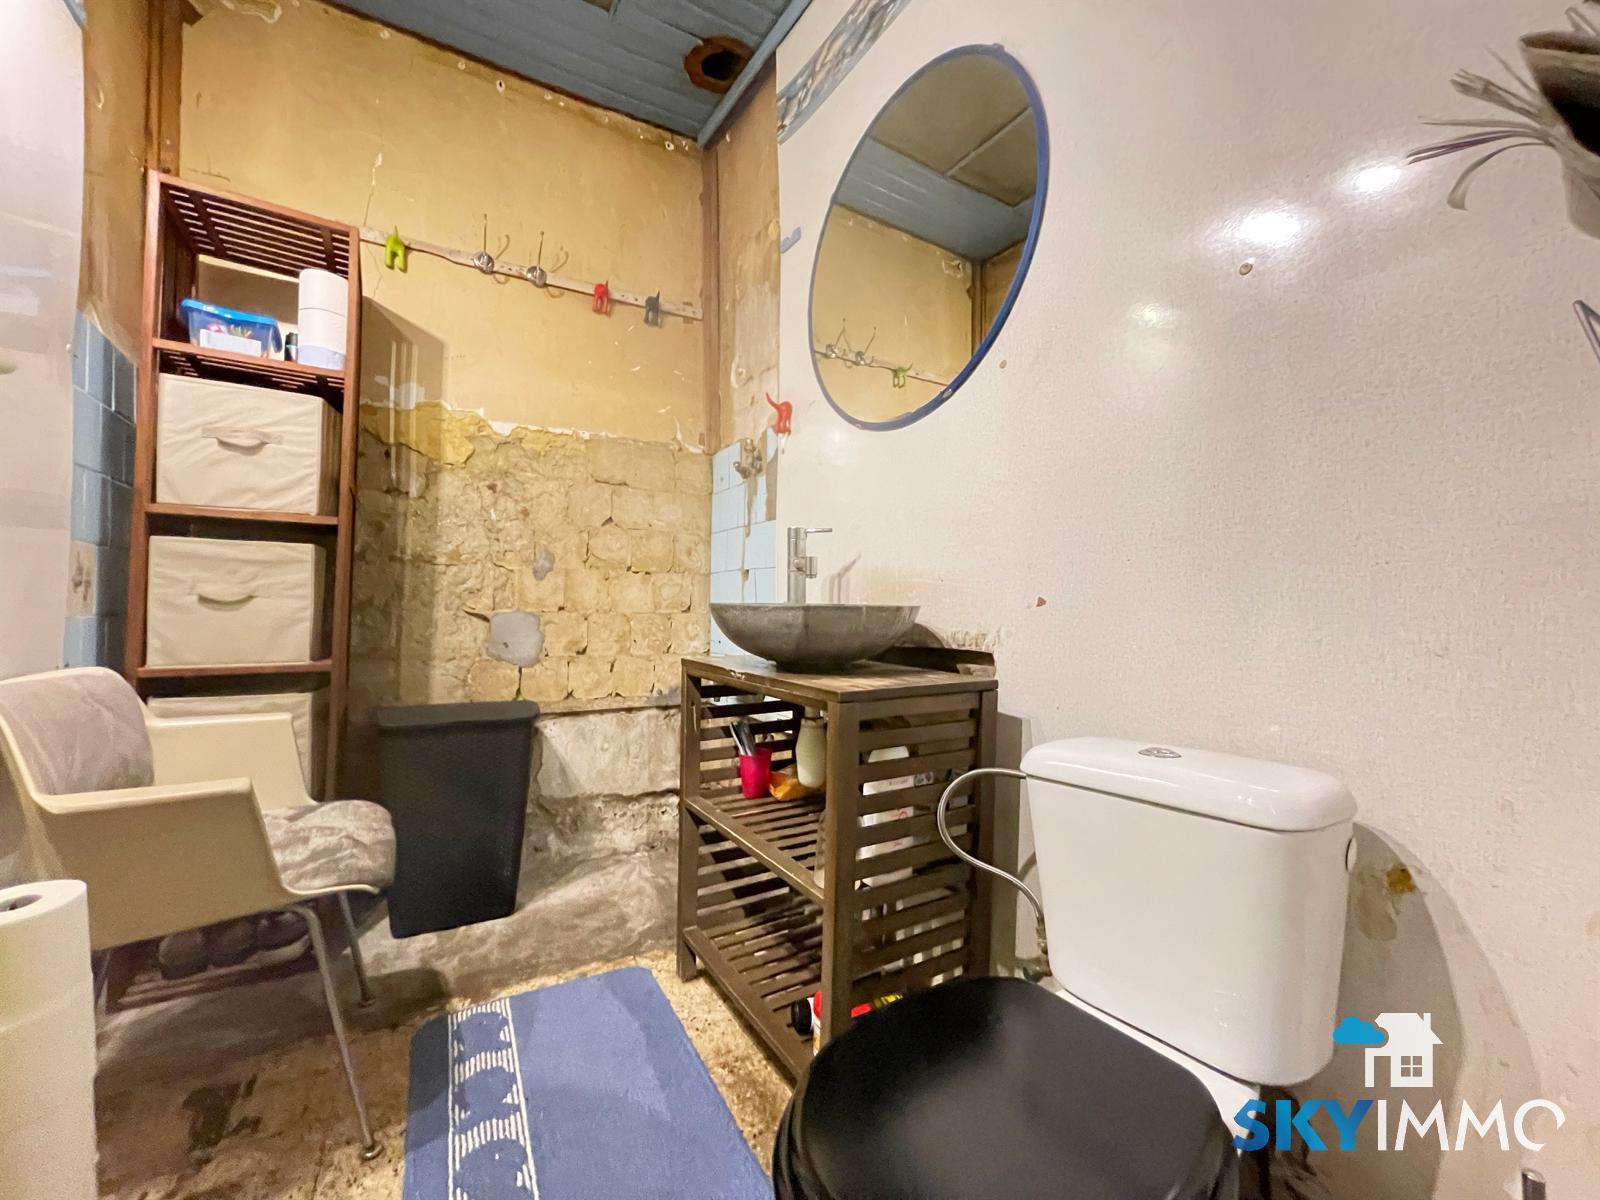 Maison - Seraing Jemeppesur-Meuse - #4517380-15